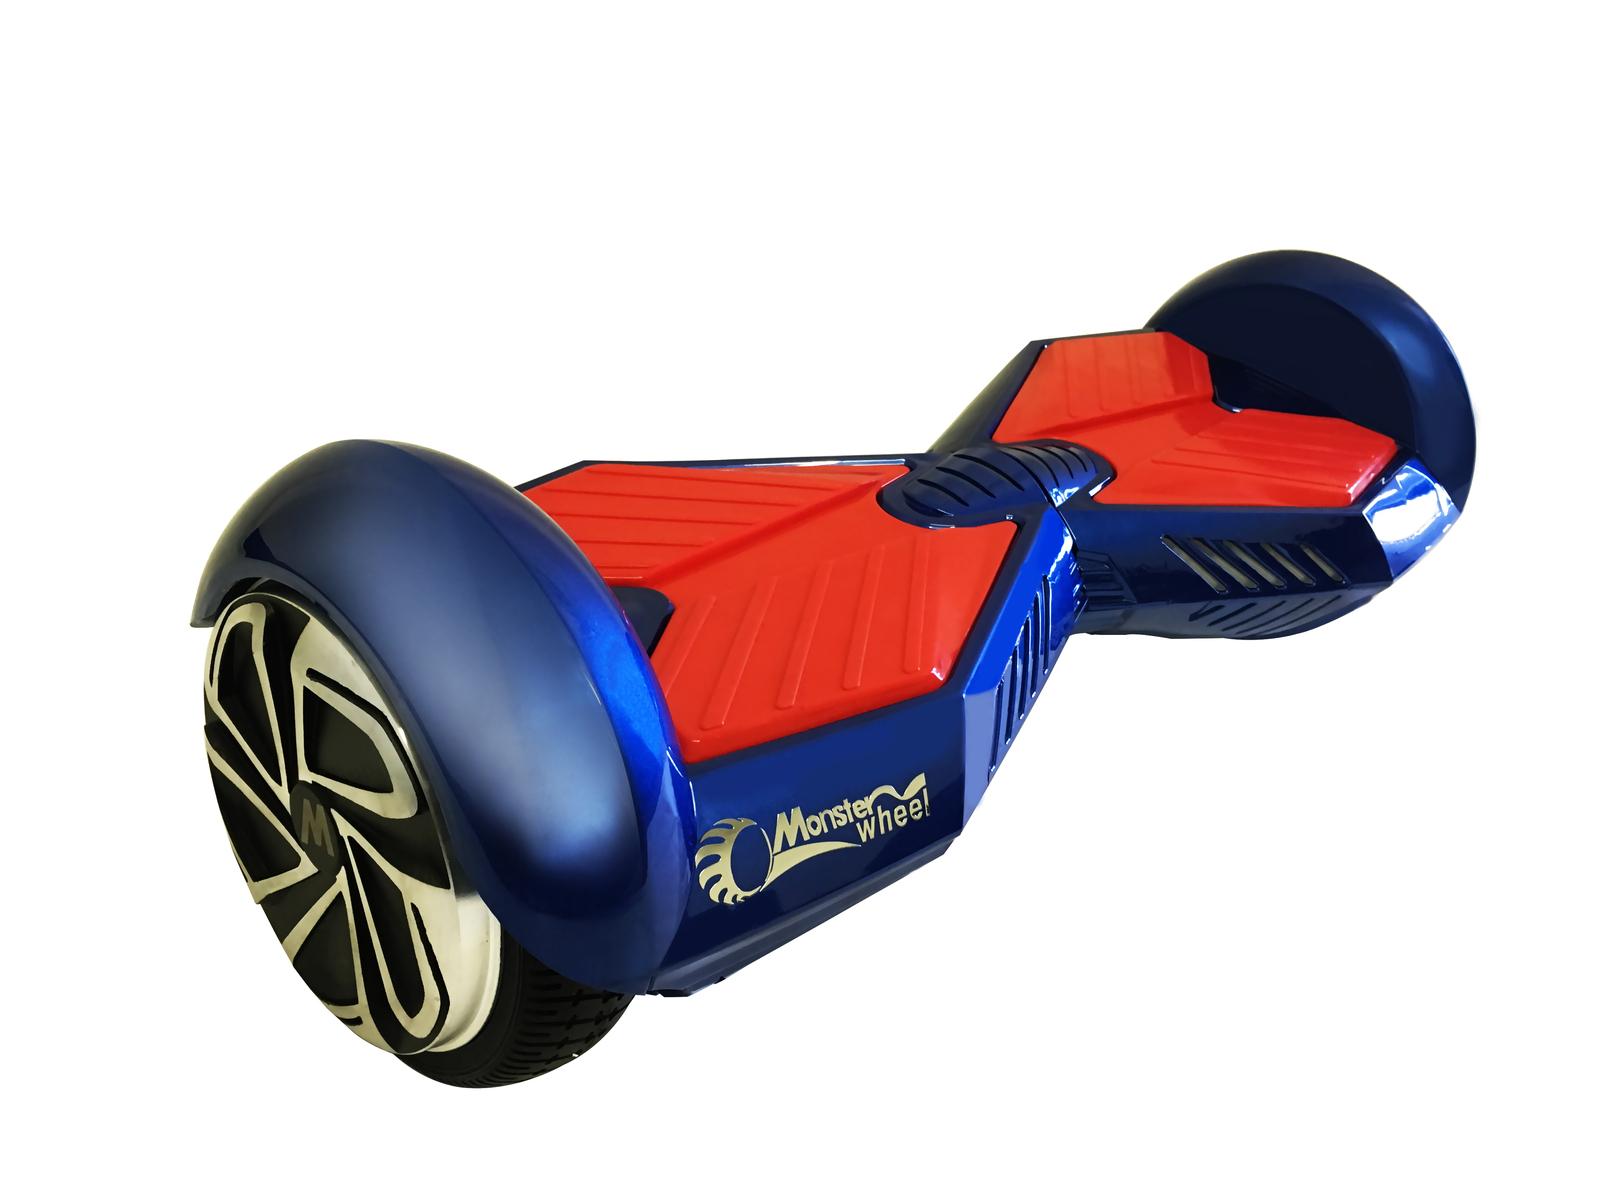 Lamborghini Monsterwheel Hoverboard With Remote Key